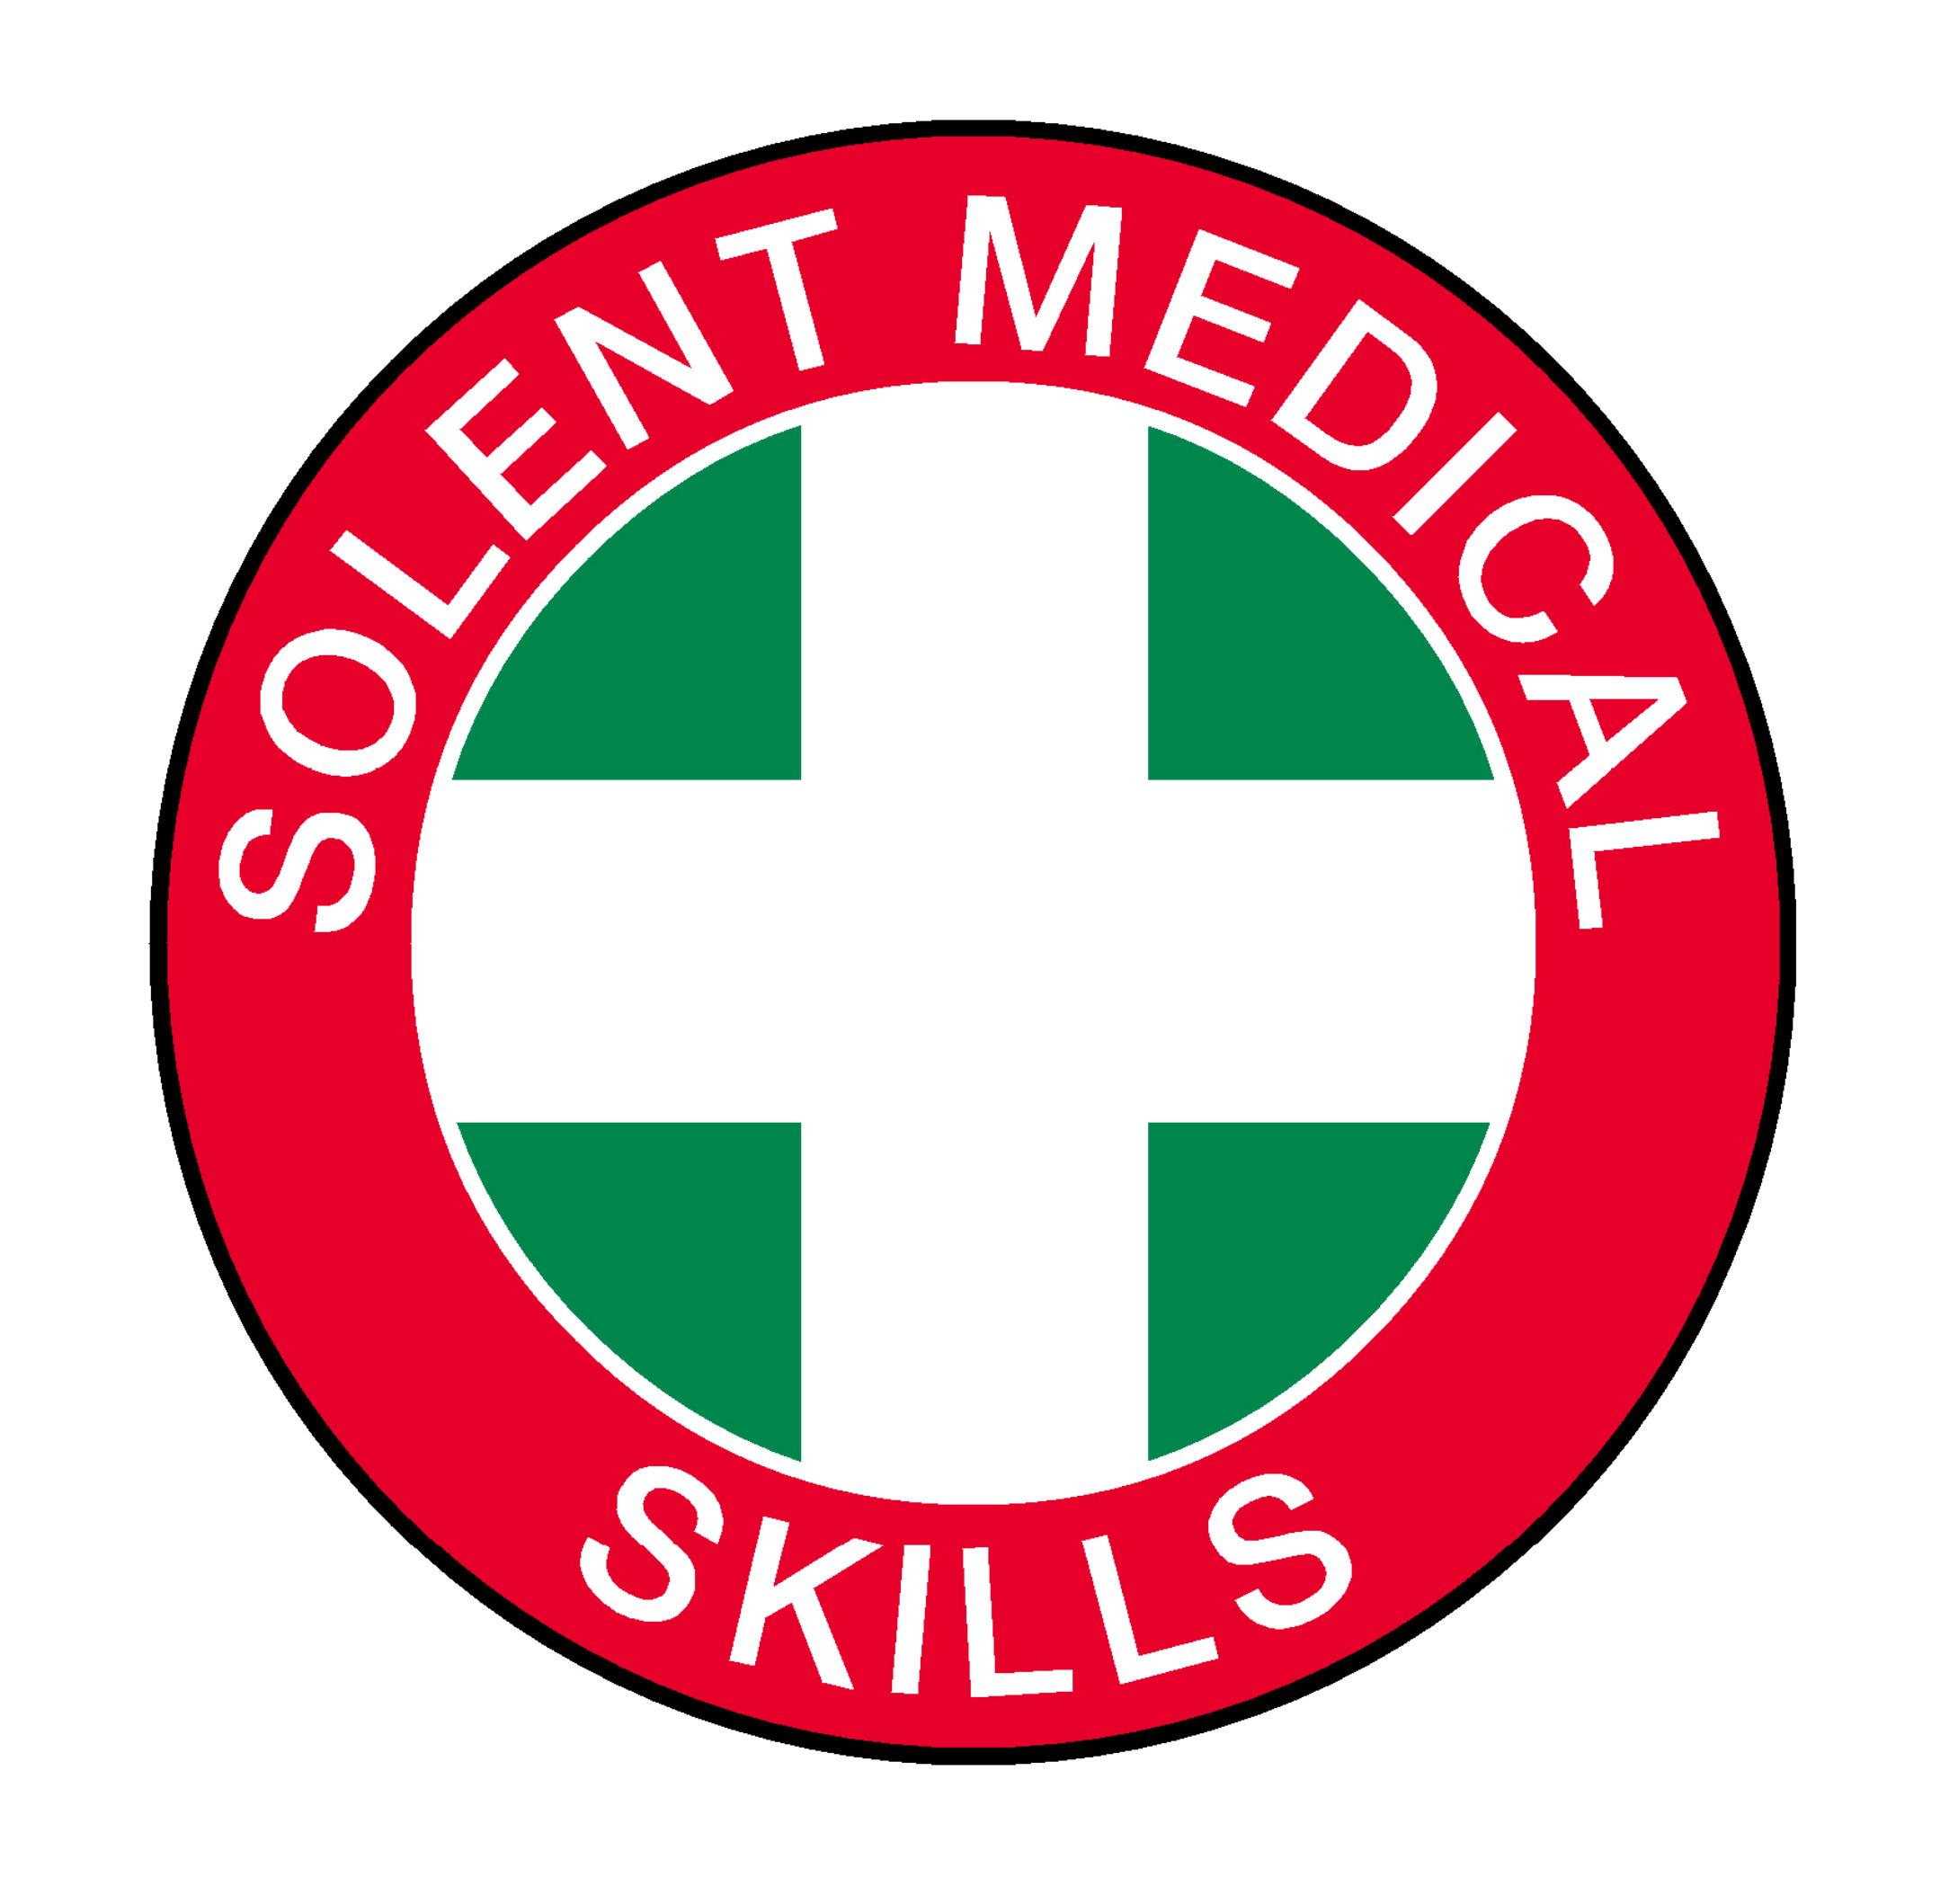 FREC Level 3 4 5 training from Solent Medical Skills